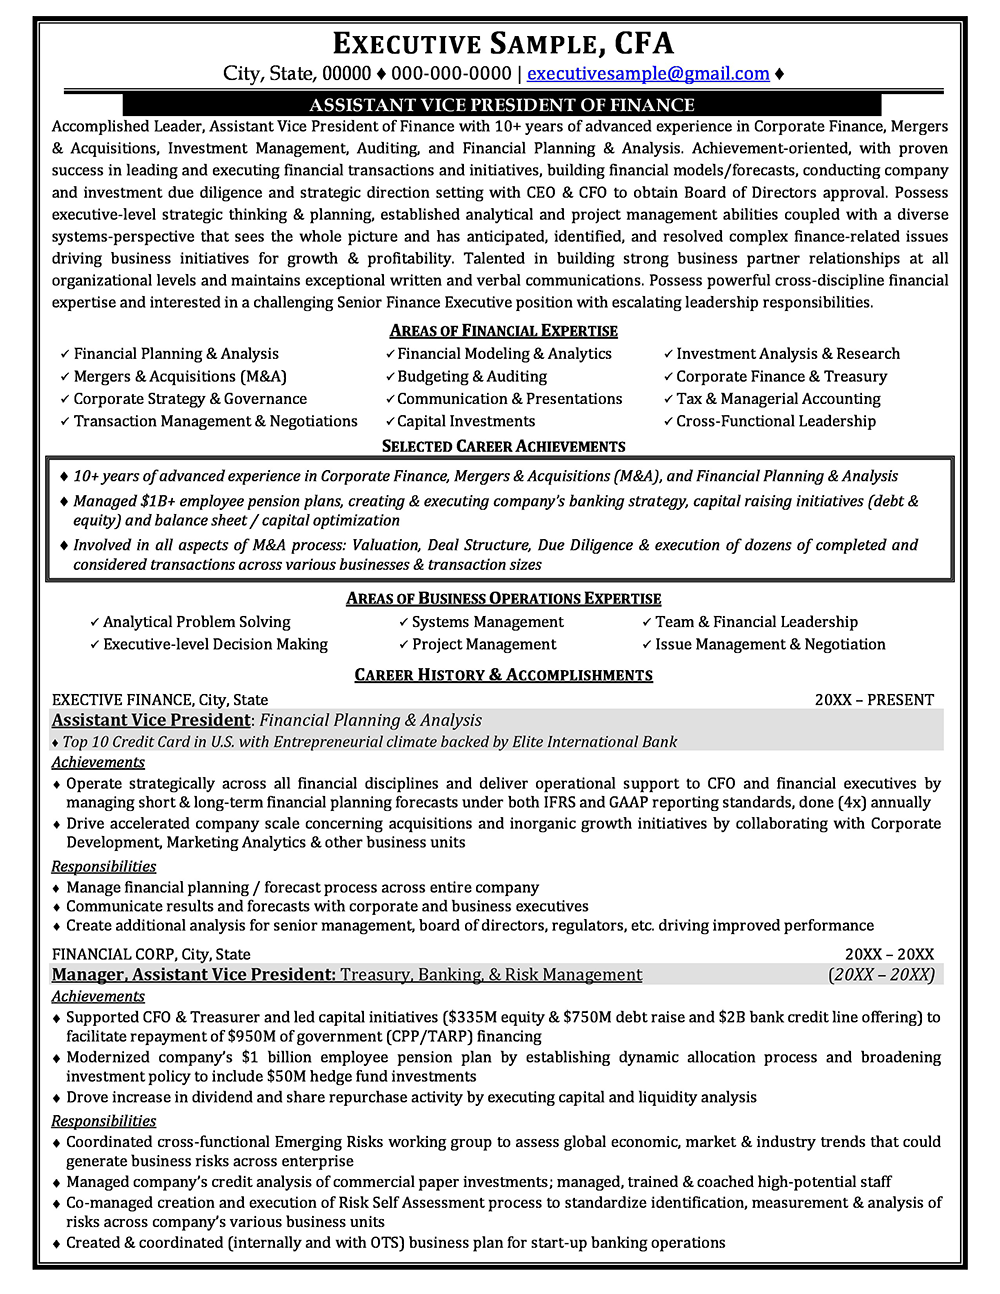 Custom resume writing 2013